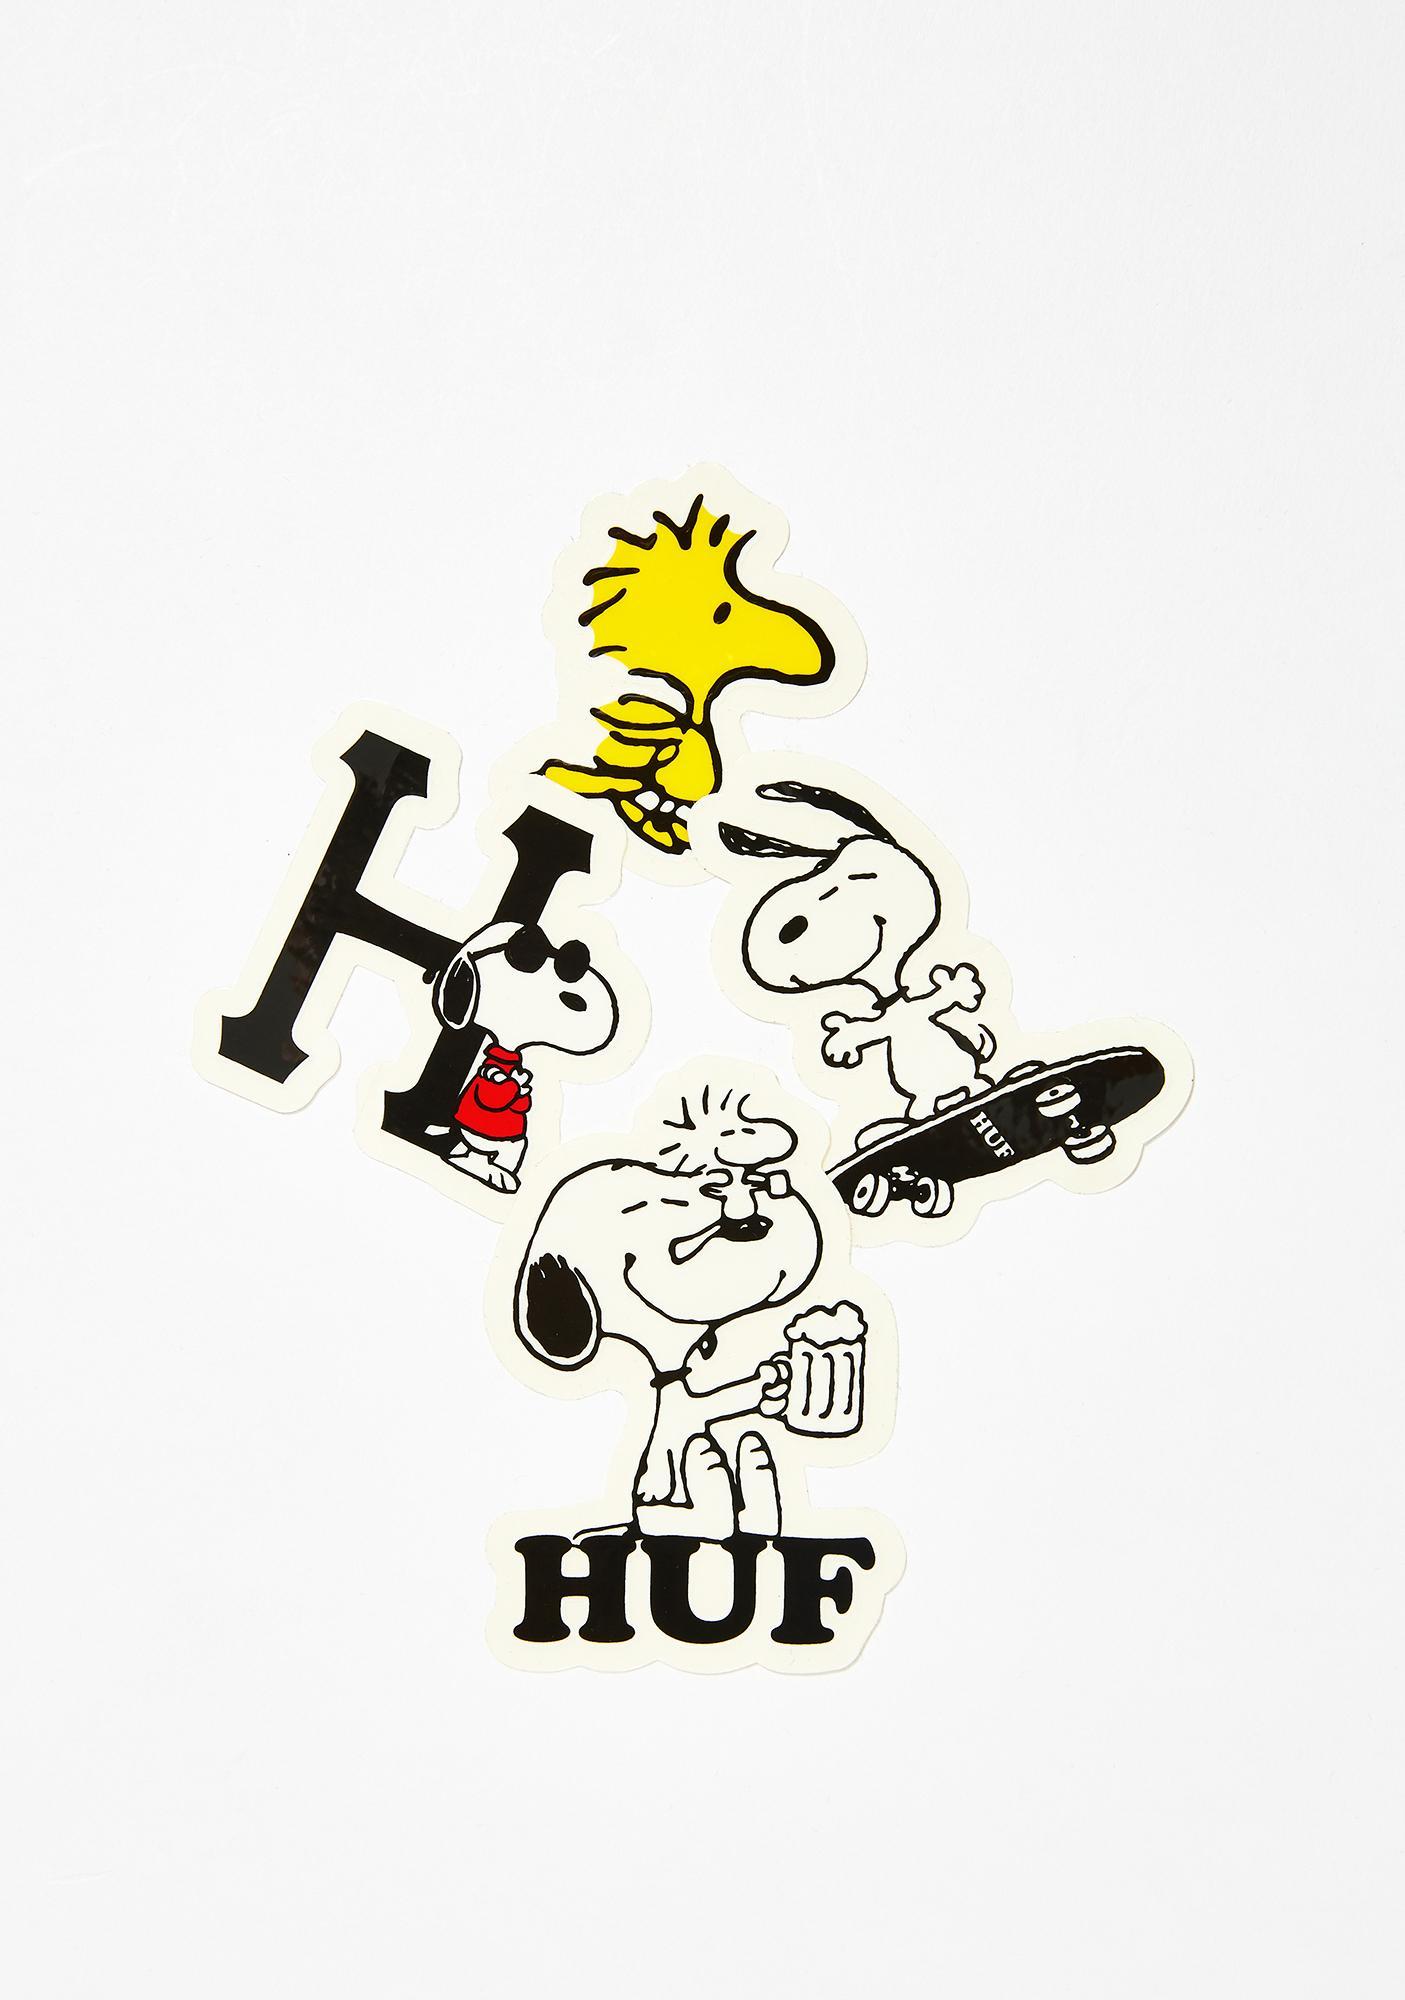 HUF Peanuts Sticker Pack